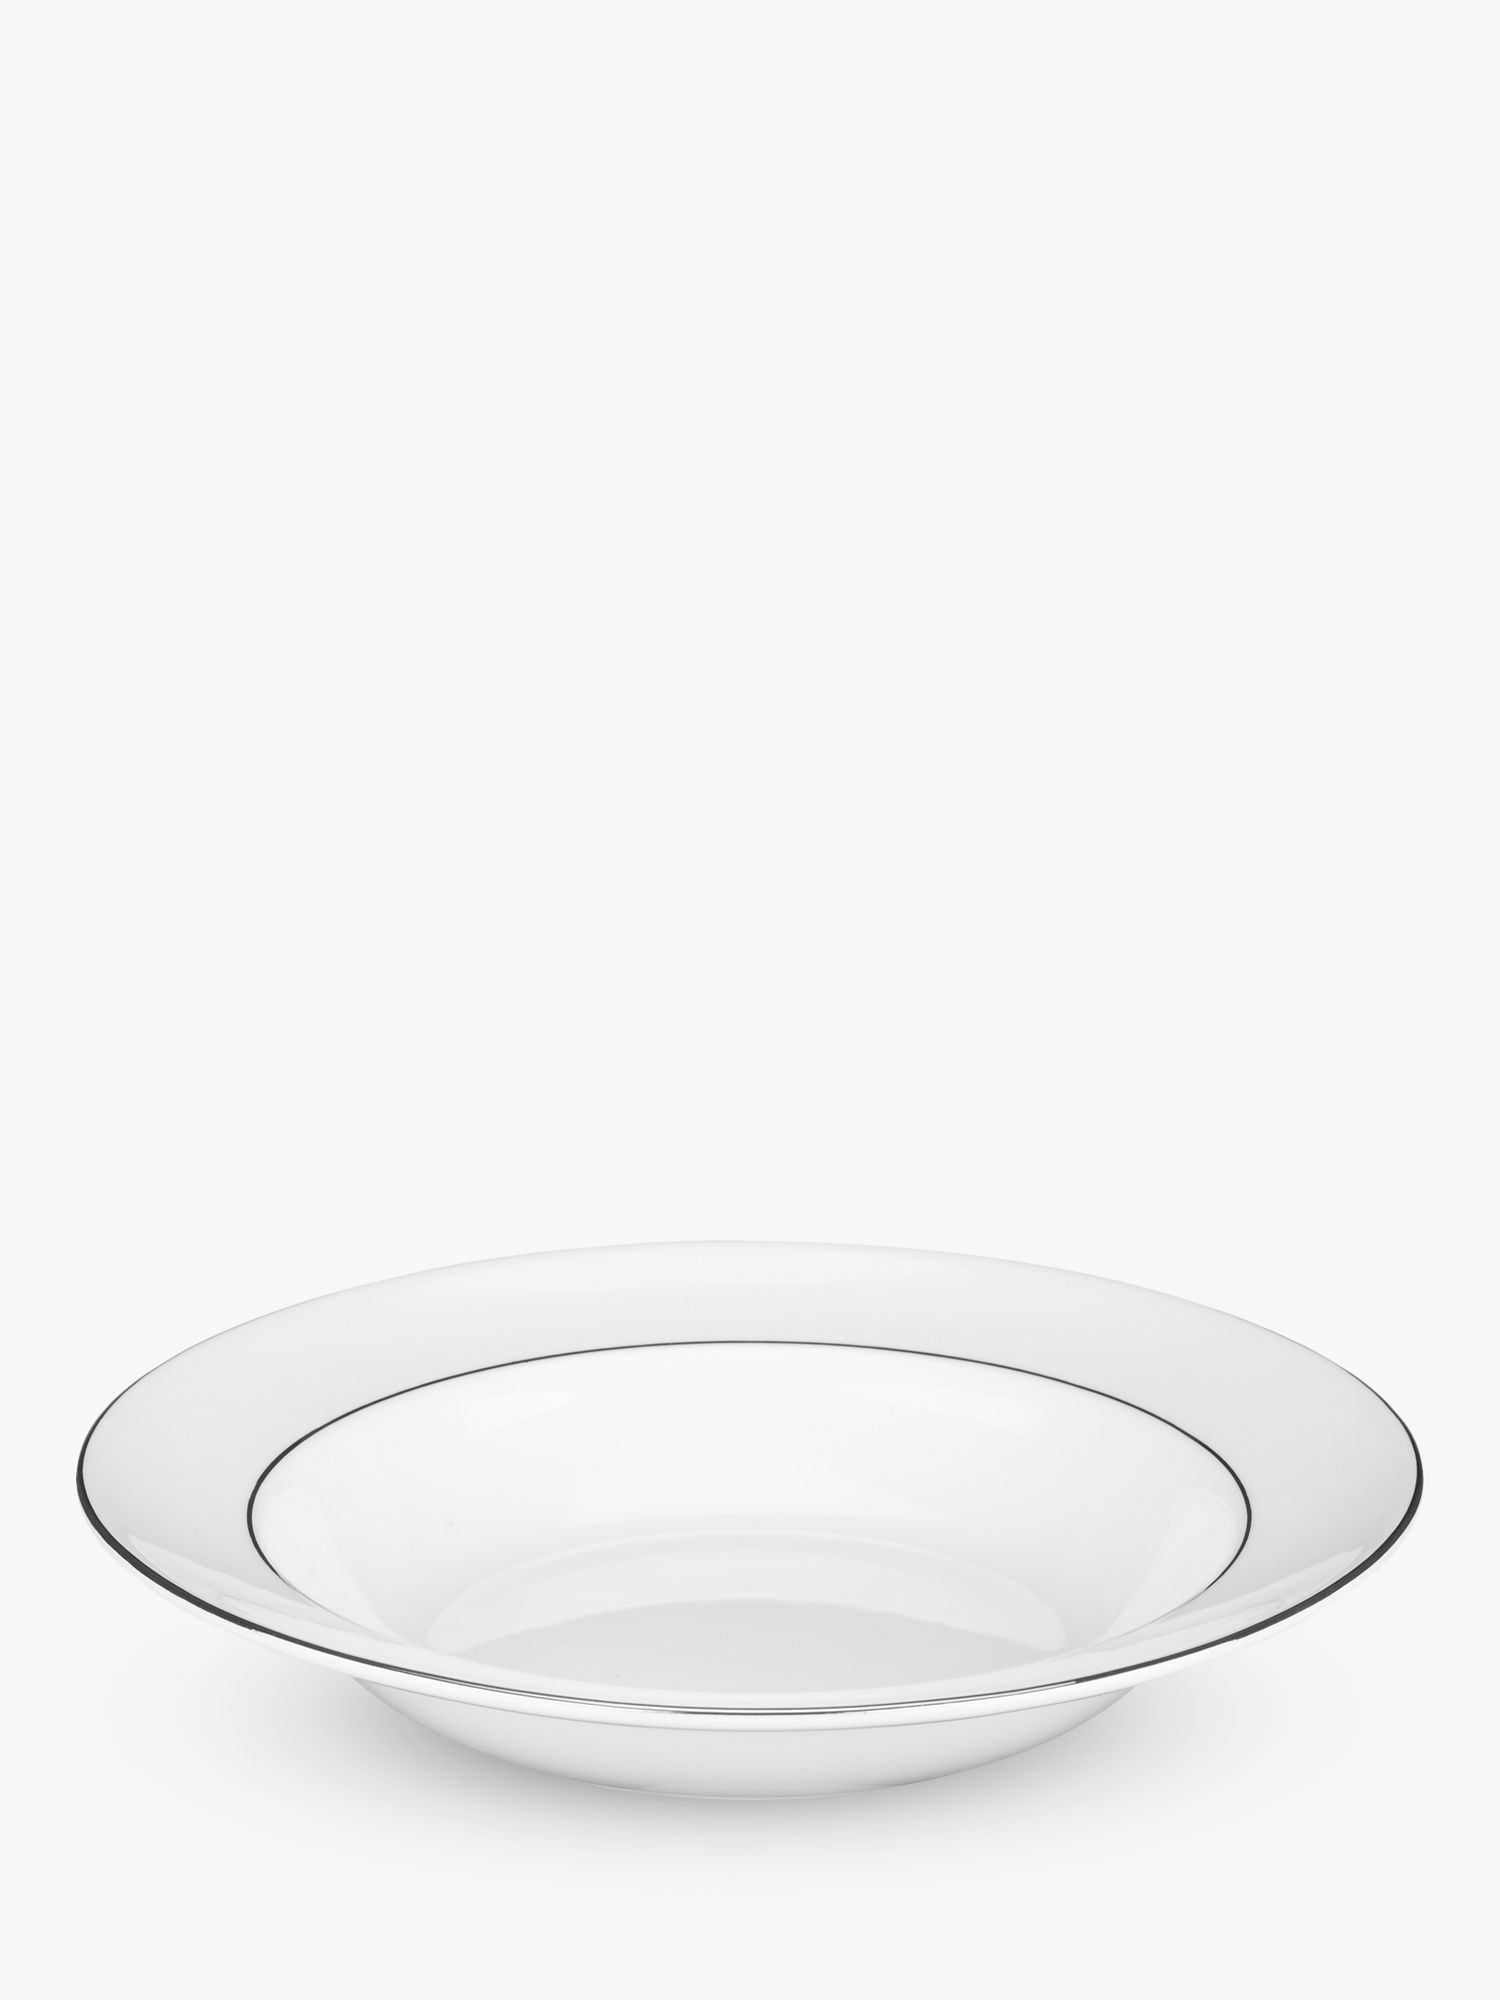 Wedgwood Wedgwood Signet Platinum 20cm Soup Plate, White